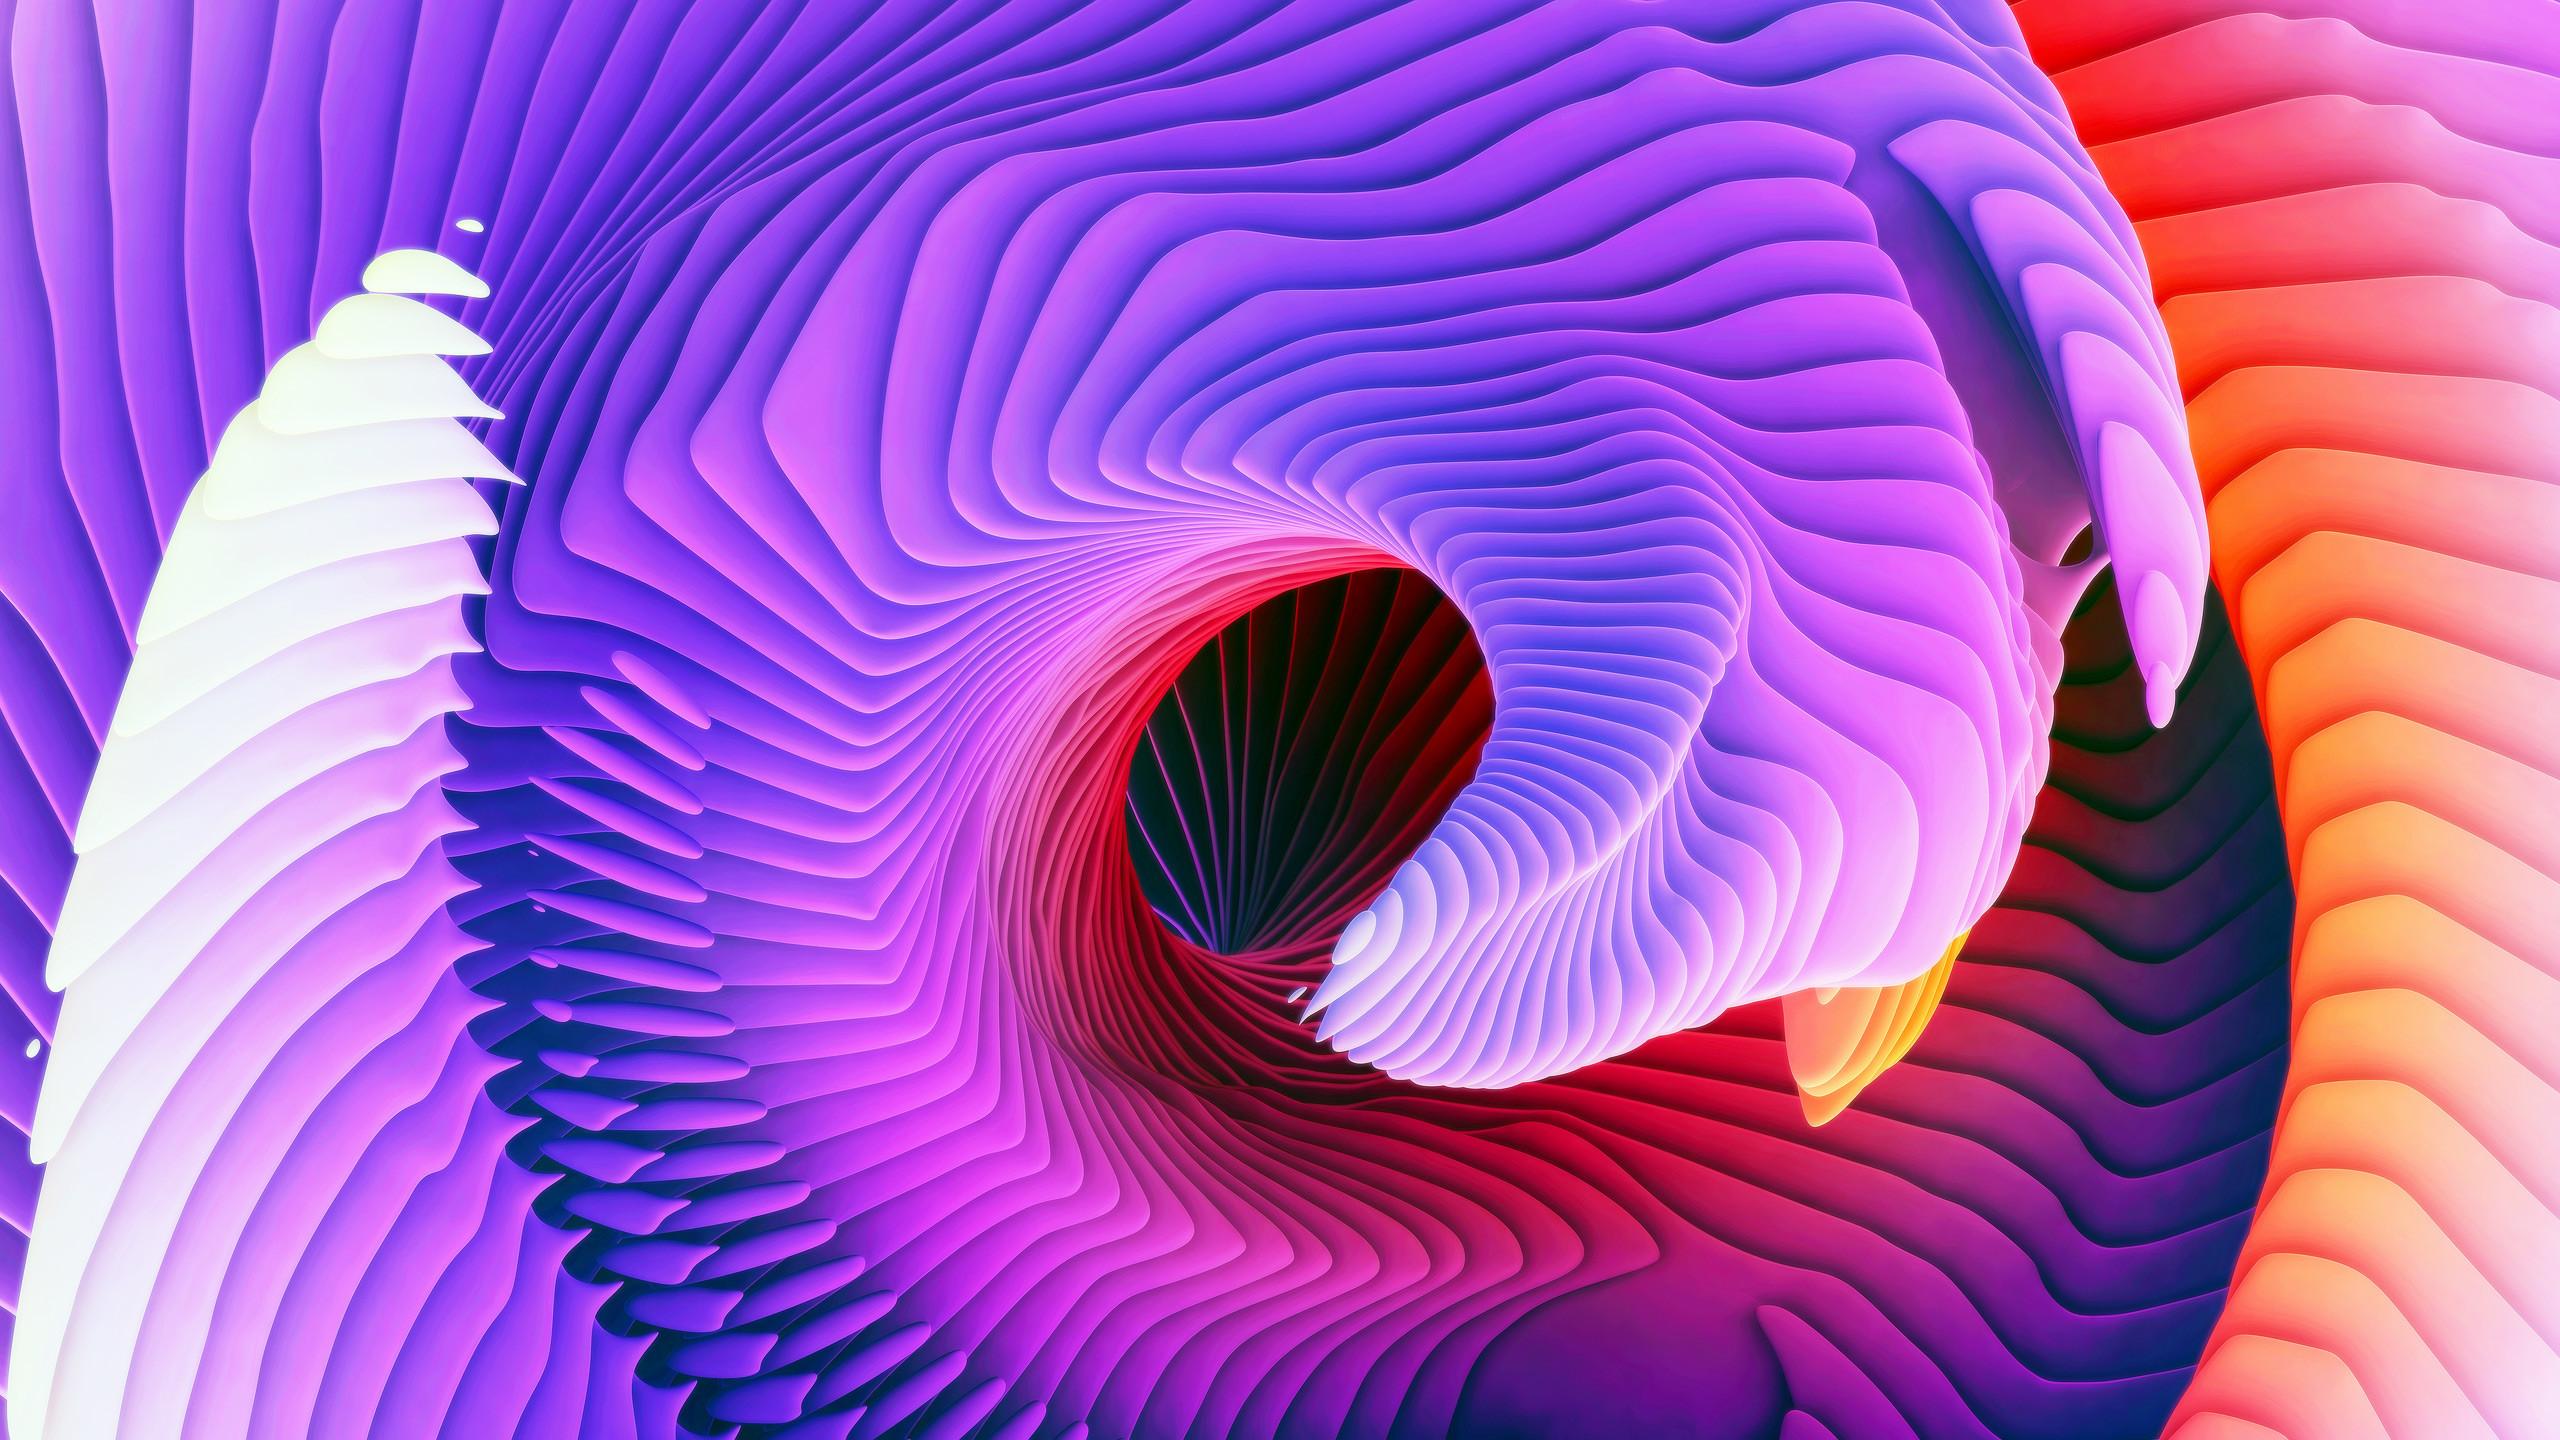 MacBook Pro Event Wallpaper ari weinkle Spiral_1B. Download via  @airweinkle: desktop (2560 …